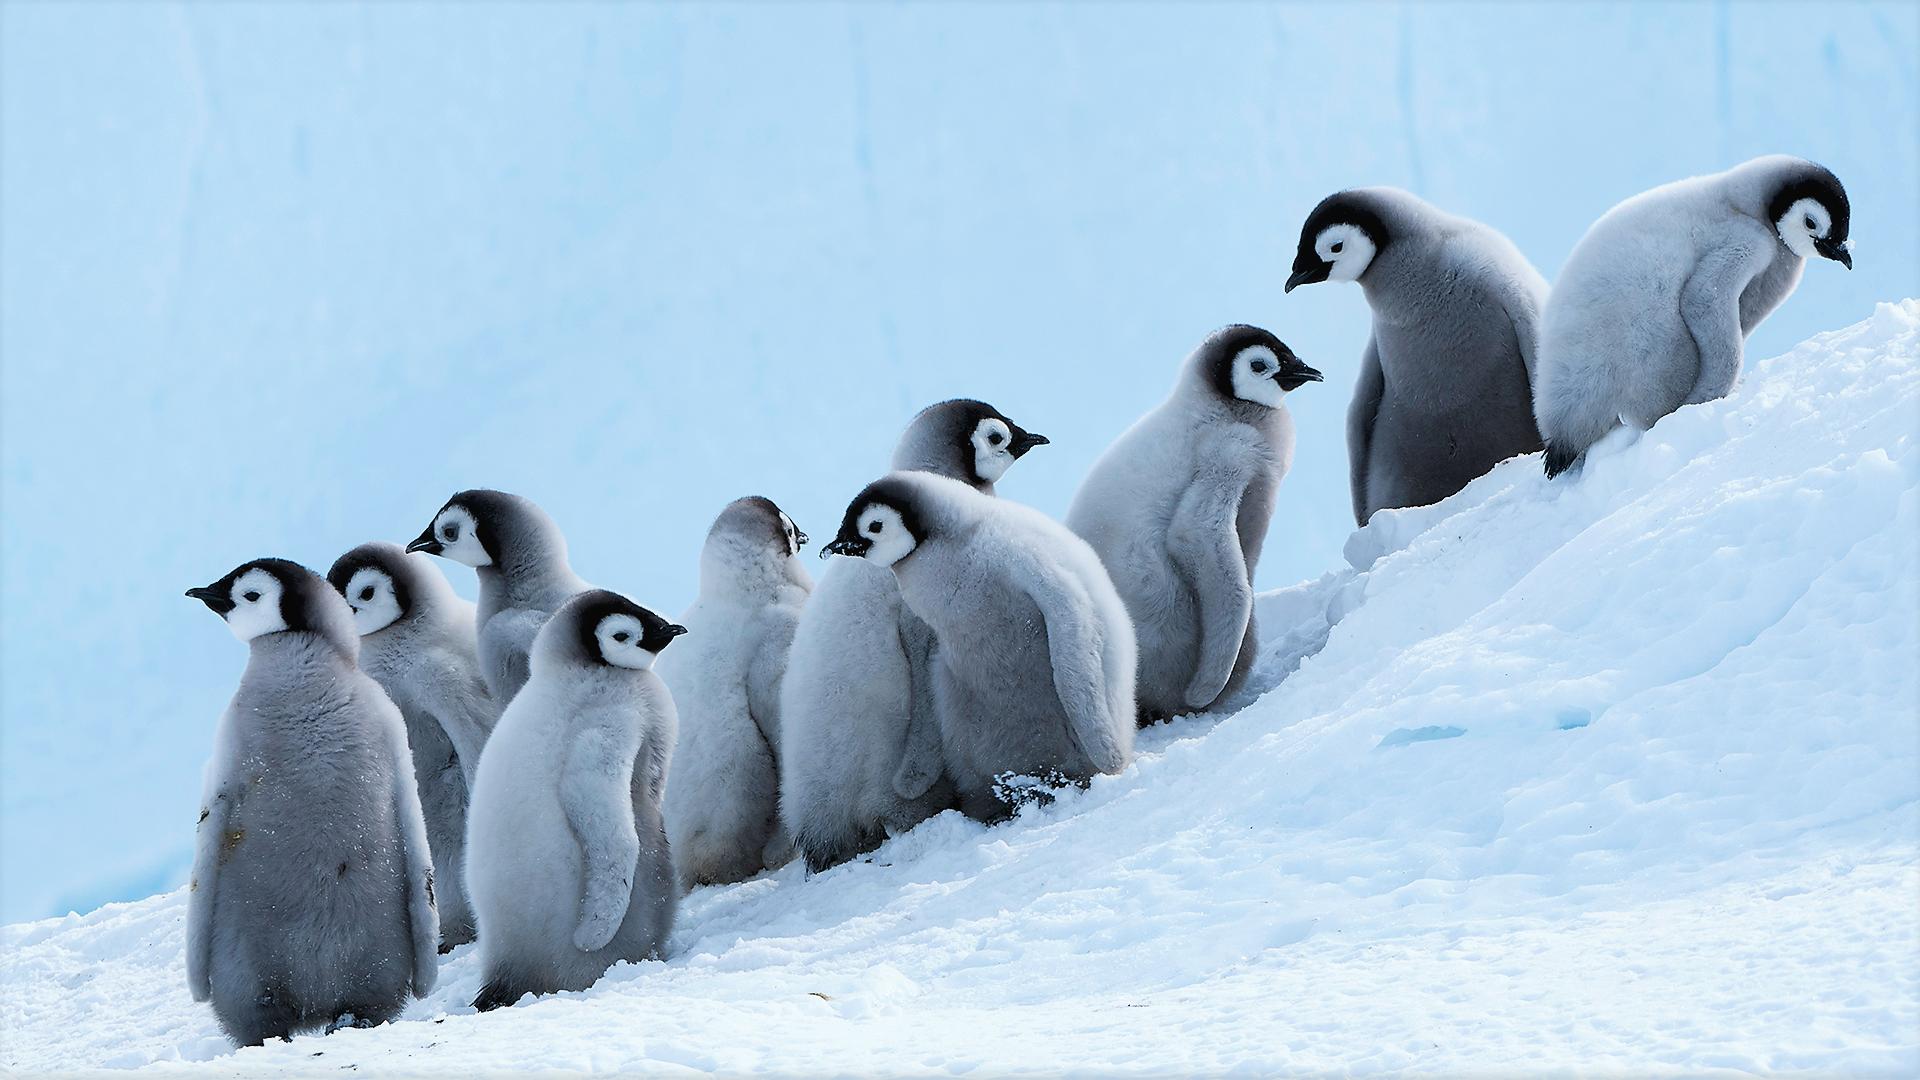 Adorable Baby Penguins In Snow Wallpaper - Cute Emperor Penguin Chicks , HD Wallpaper & Backgrounds